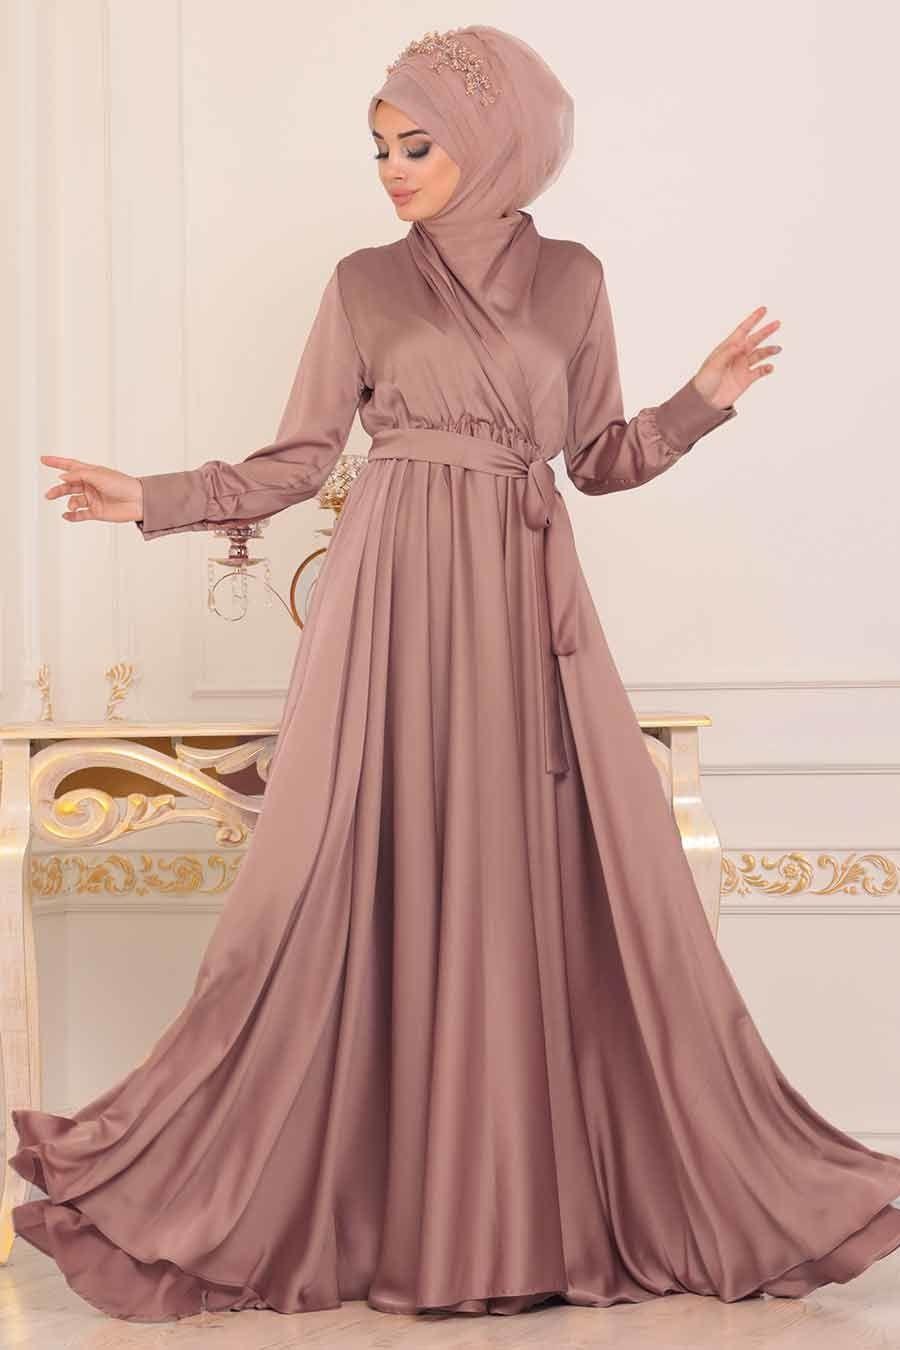 Tesetturlu Abiye Elbise V Yaka Krep Saten Pudra Tesettur Abiye Elbise 1418pd Tesetturisland Com Moda Stilleri Elbise Stil Ilhami